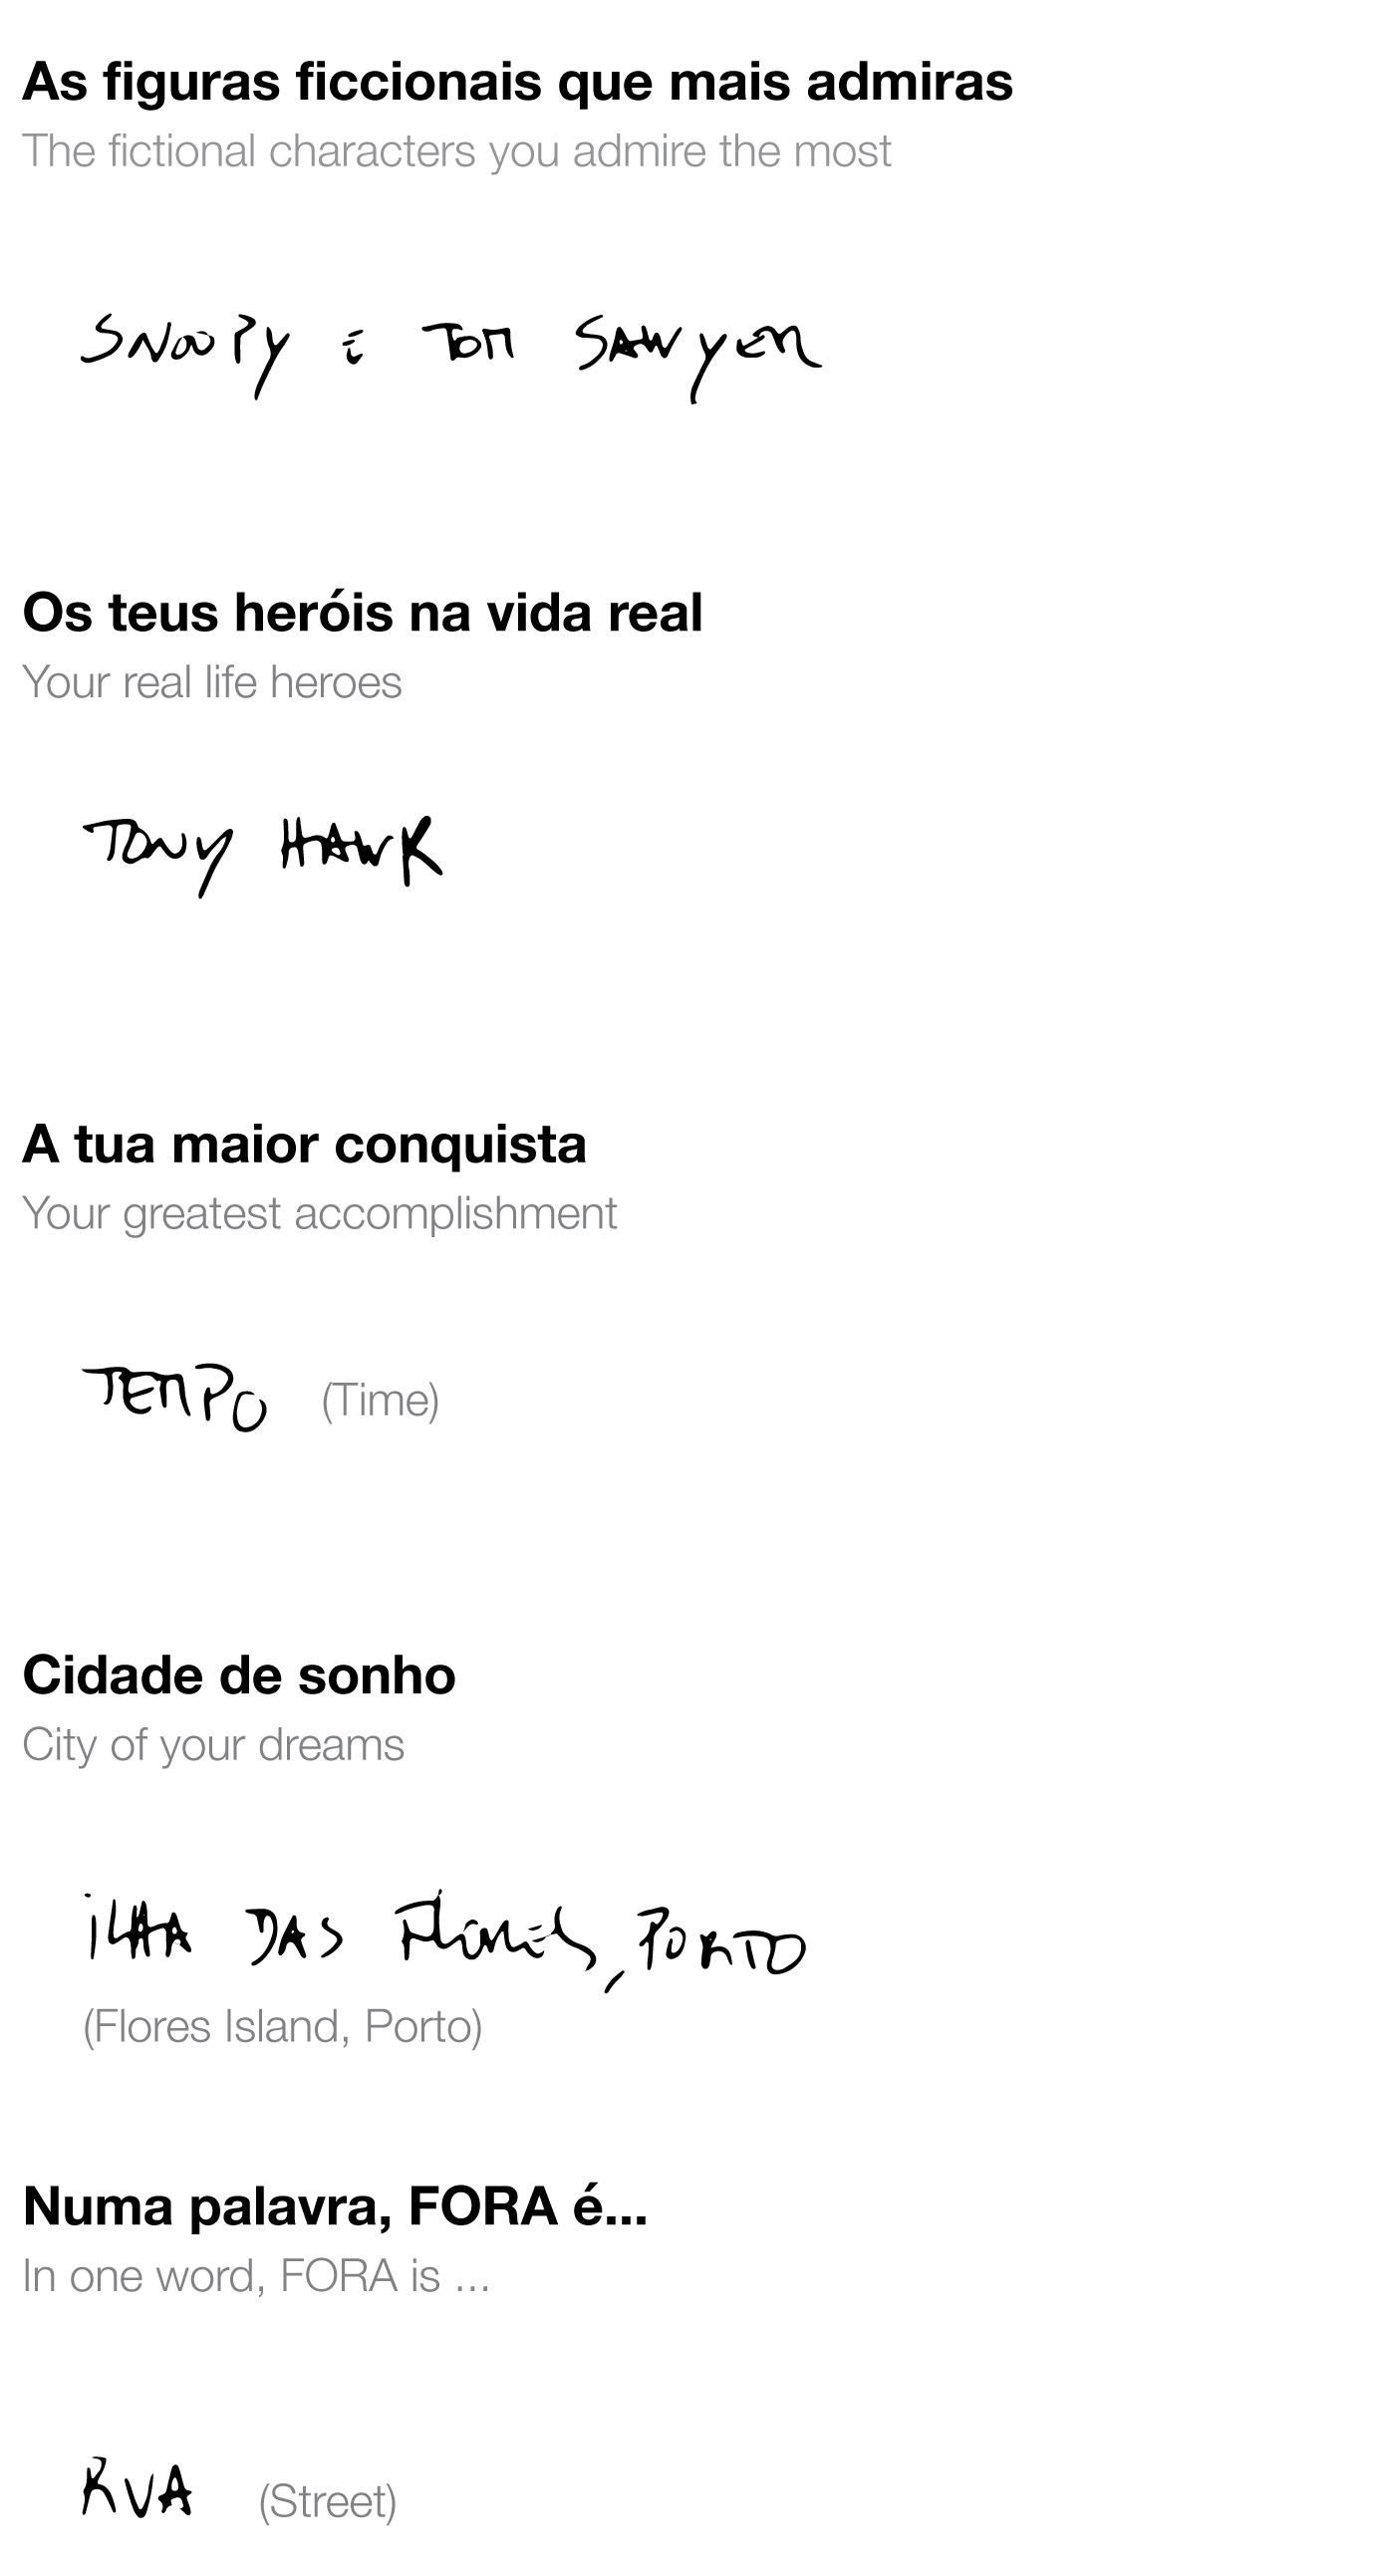 perguntas_gonçaloprudencio-02.png